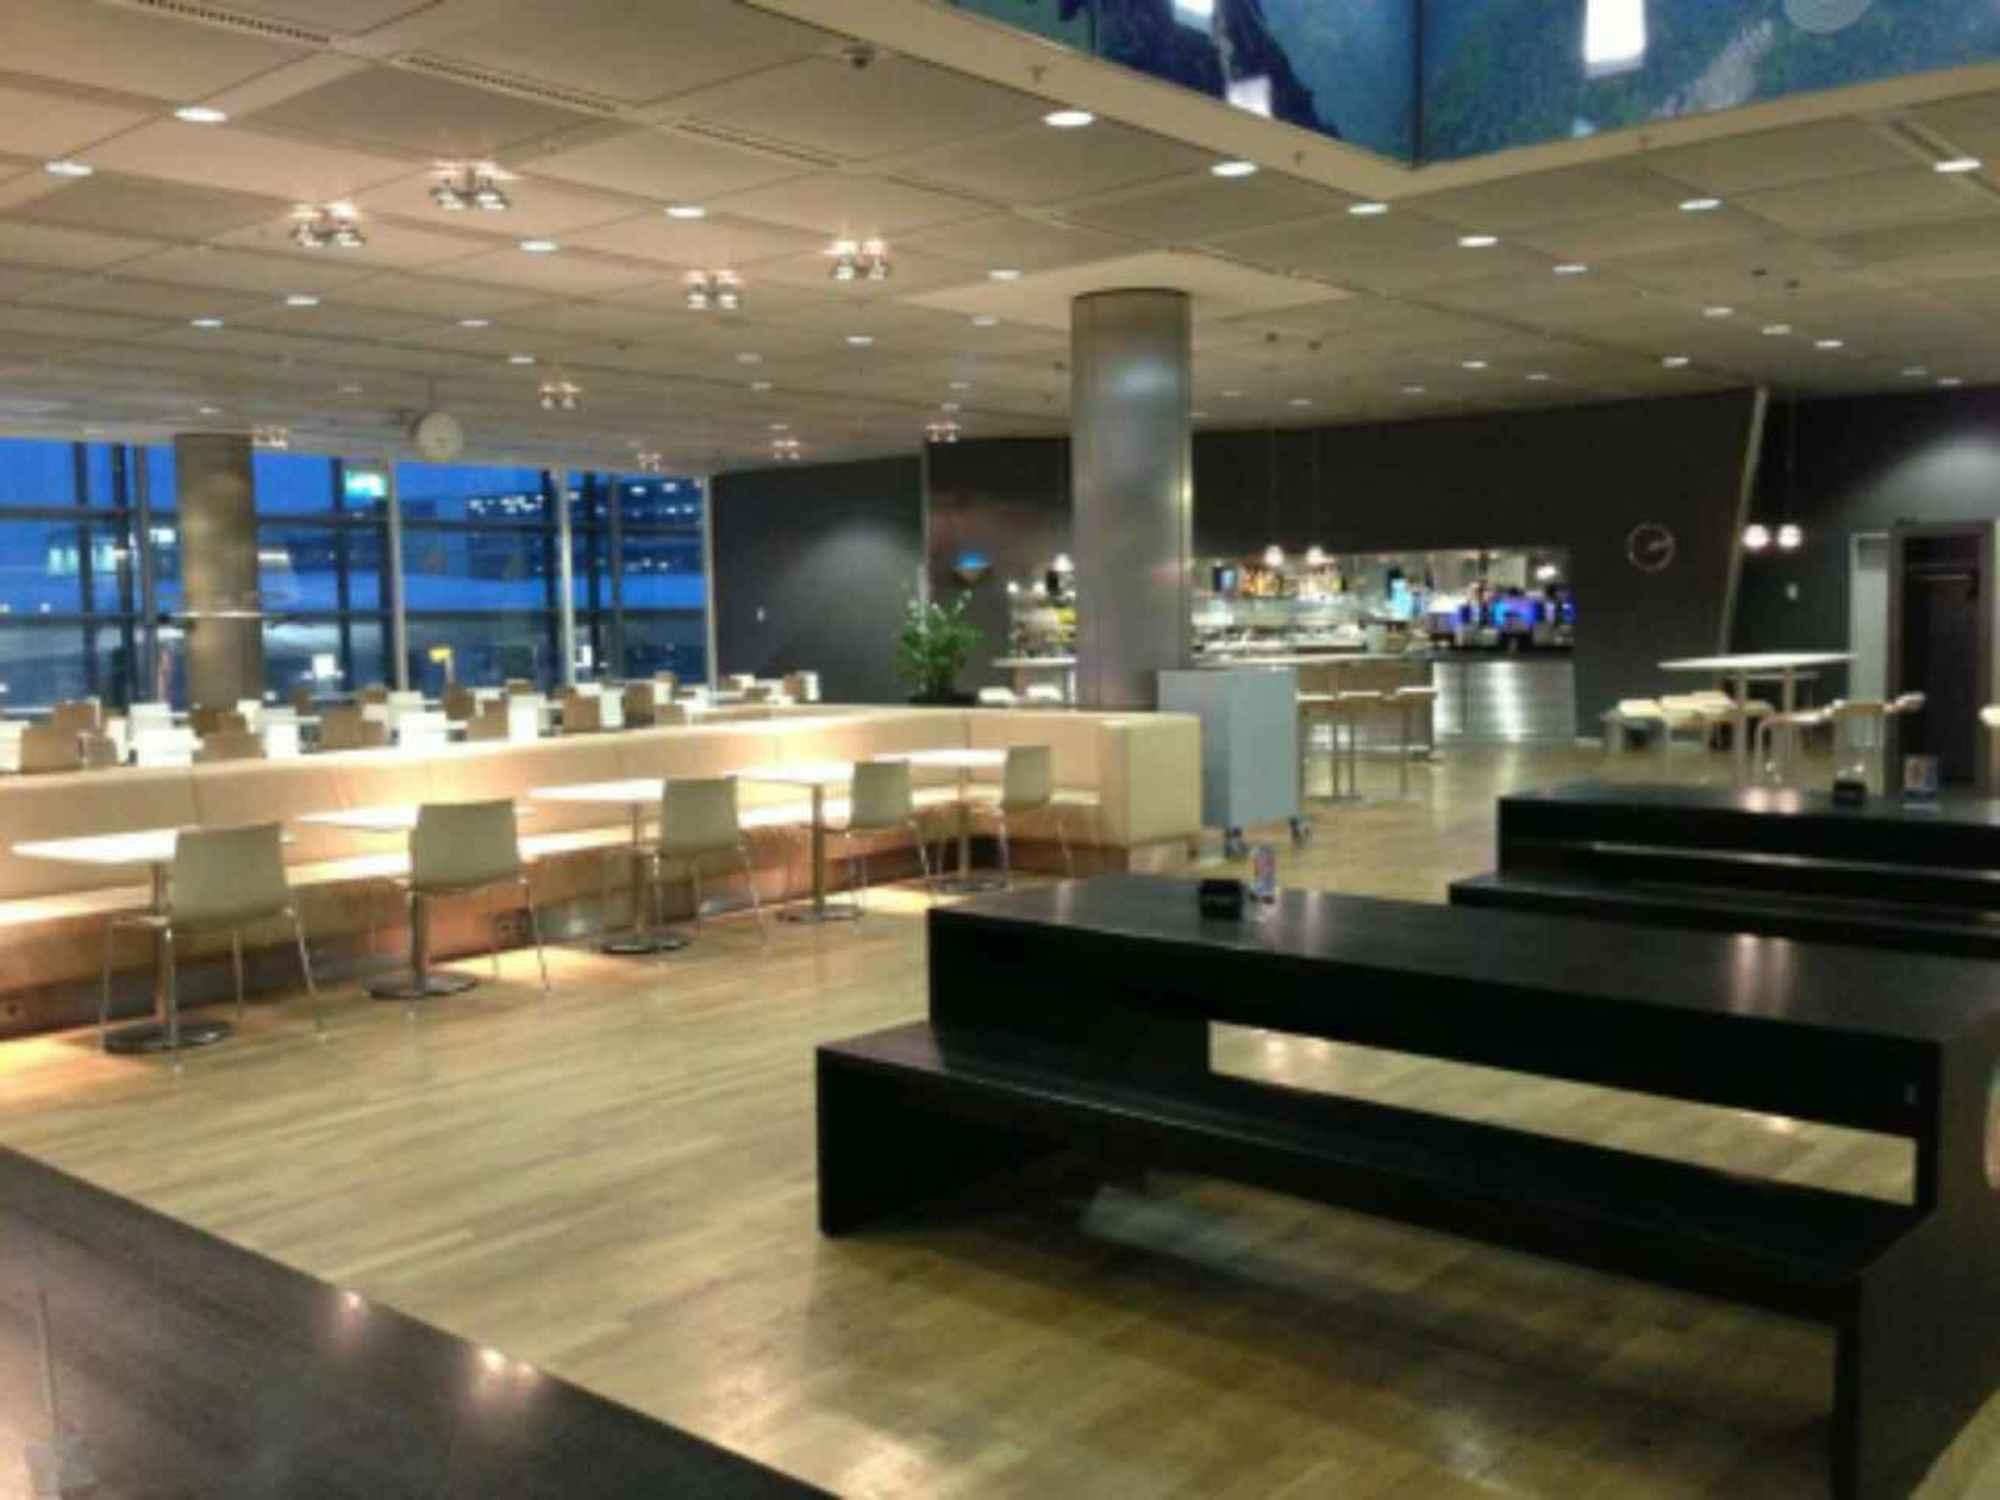 Flughafen Lounge Birmingham Rabatt